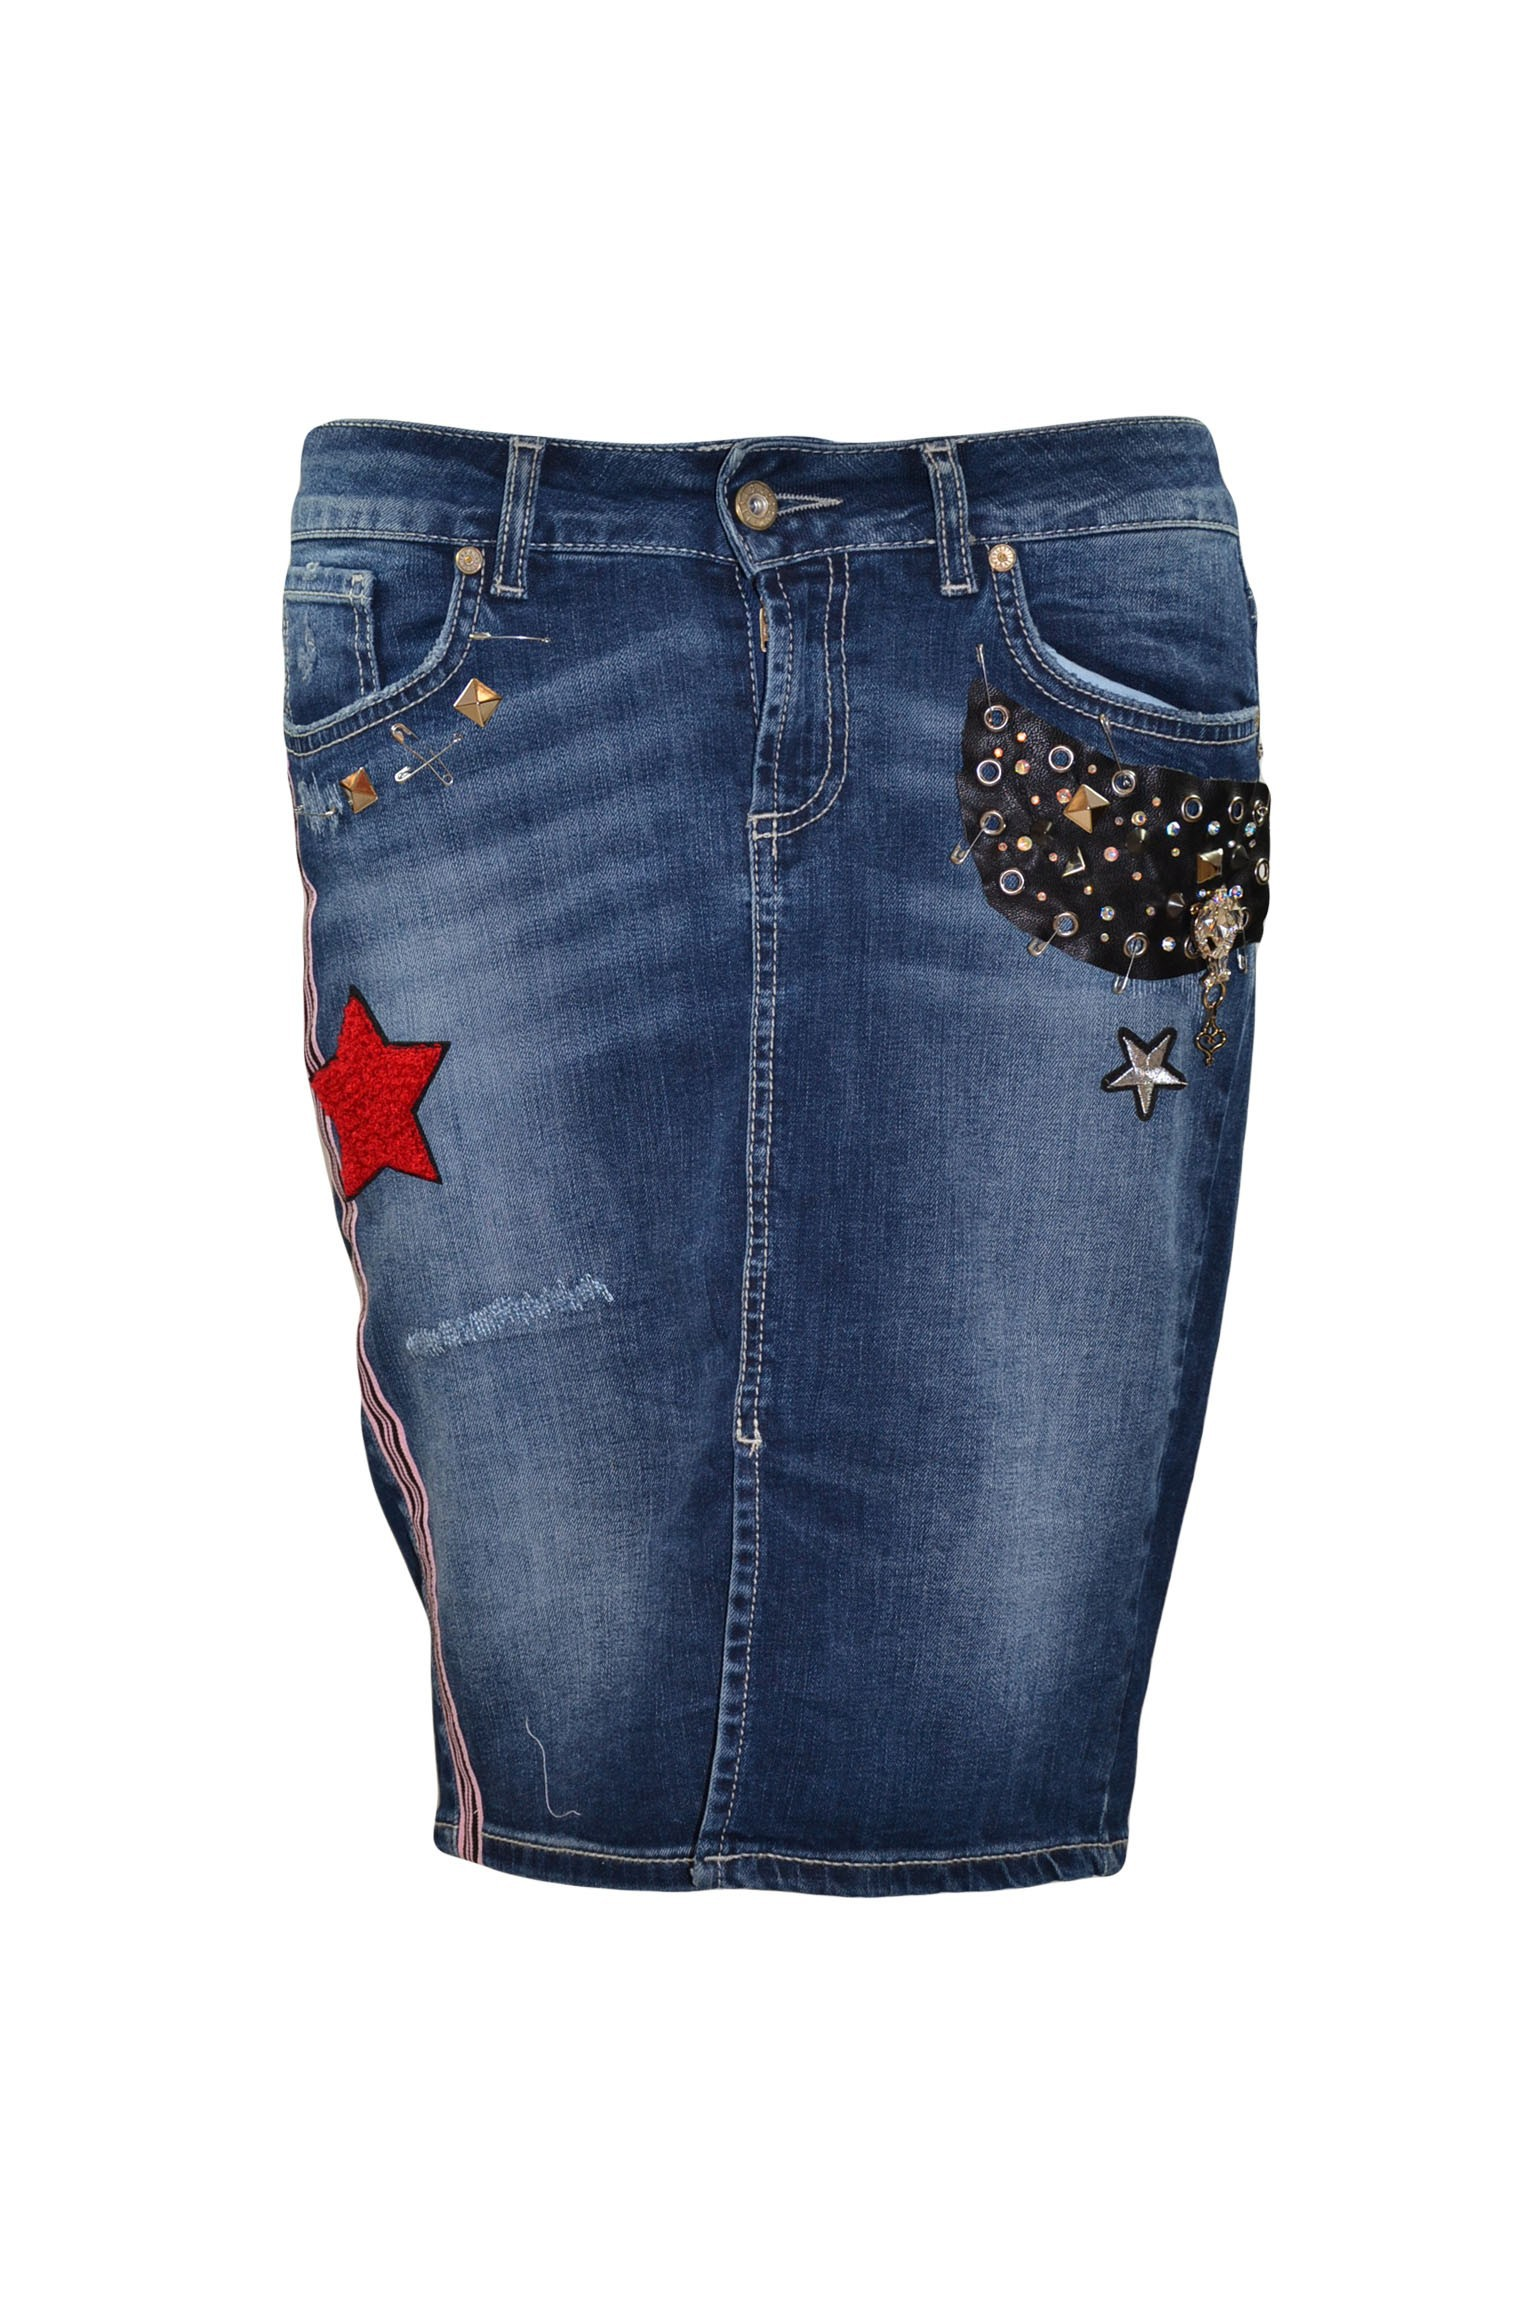 Rossodisera spódnica jeans j7840stella